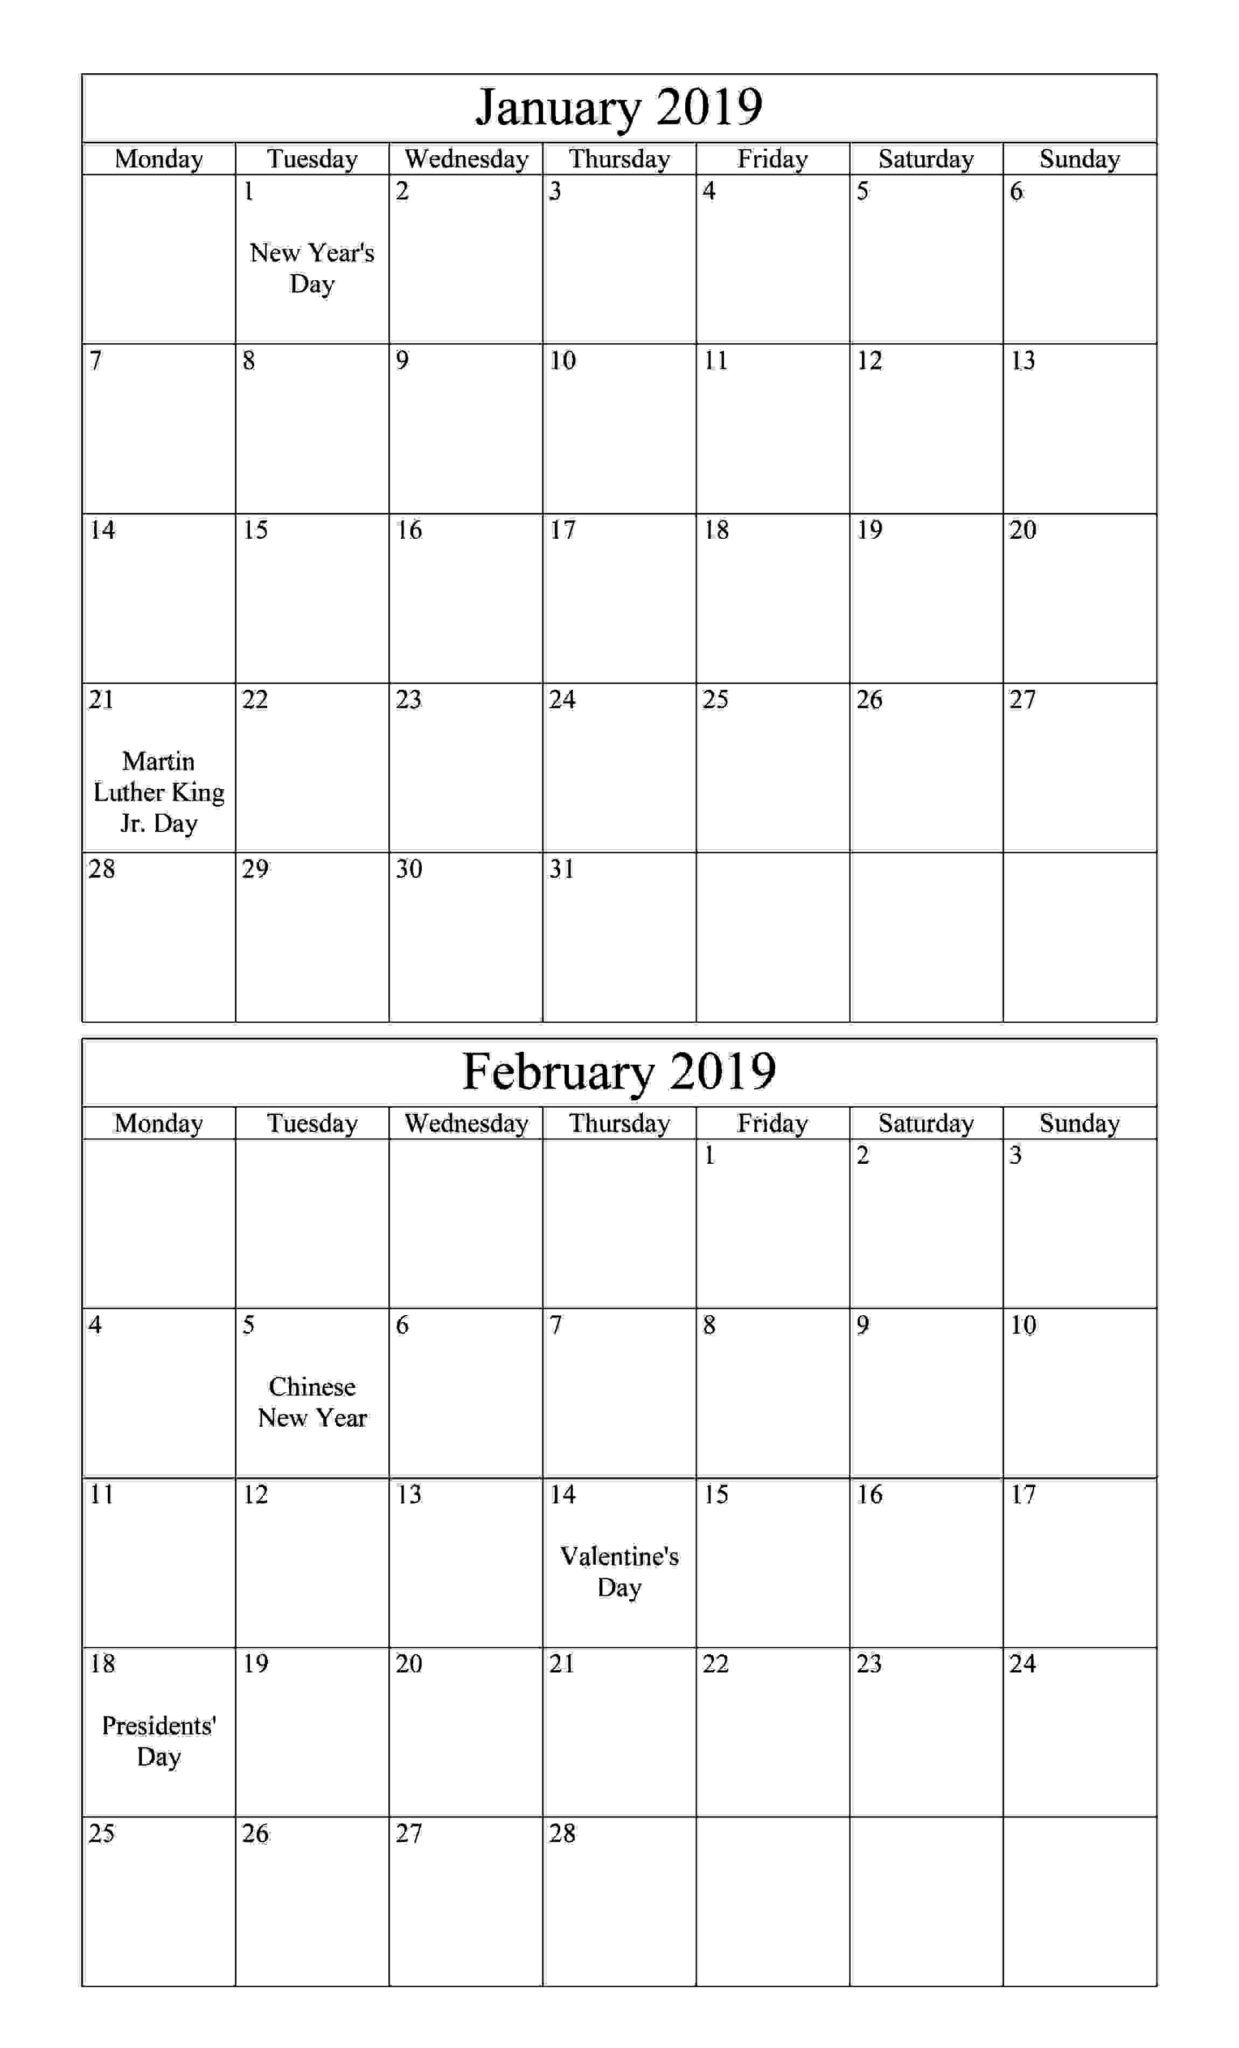 January February Calendar With Holiday